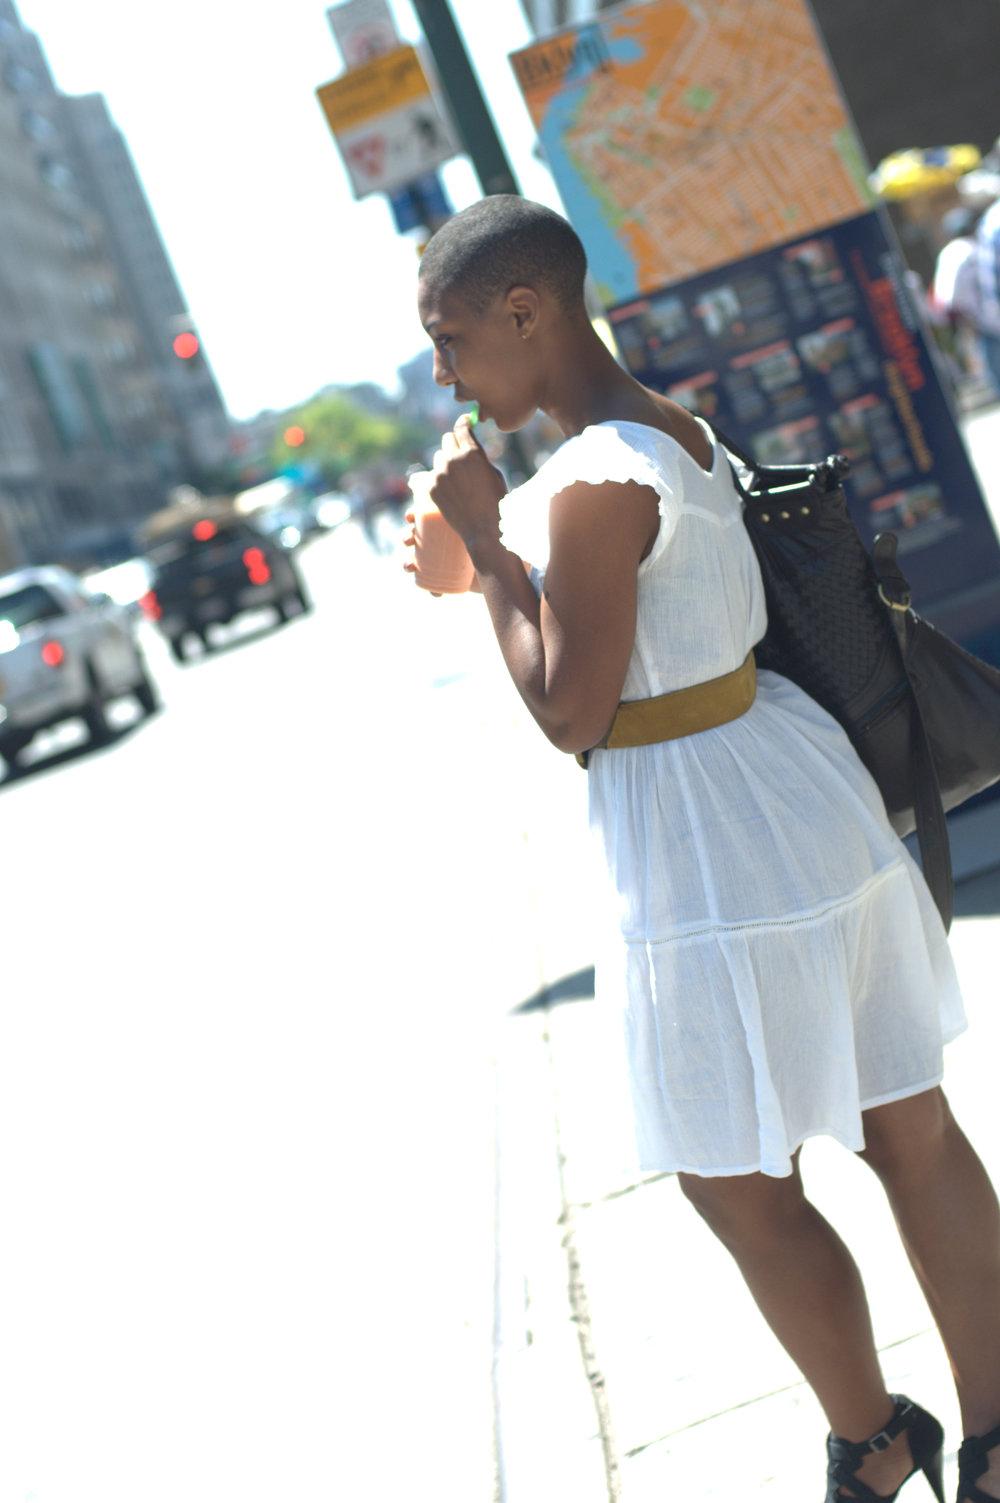 2012, Brooklyn. Photo by Olushola Bashorun